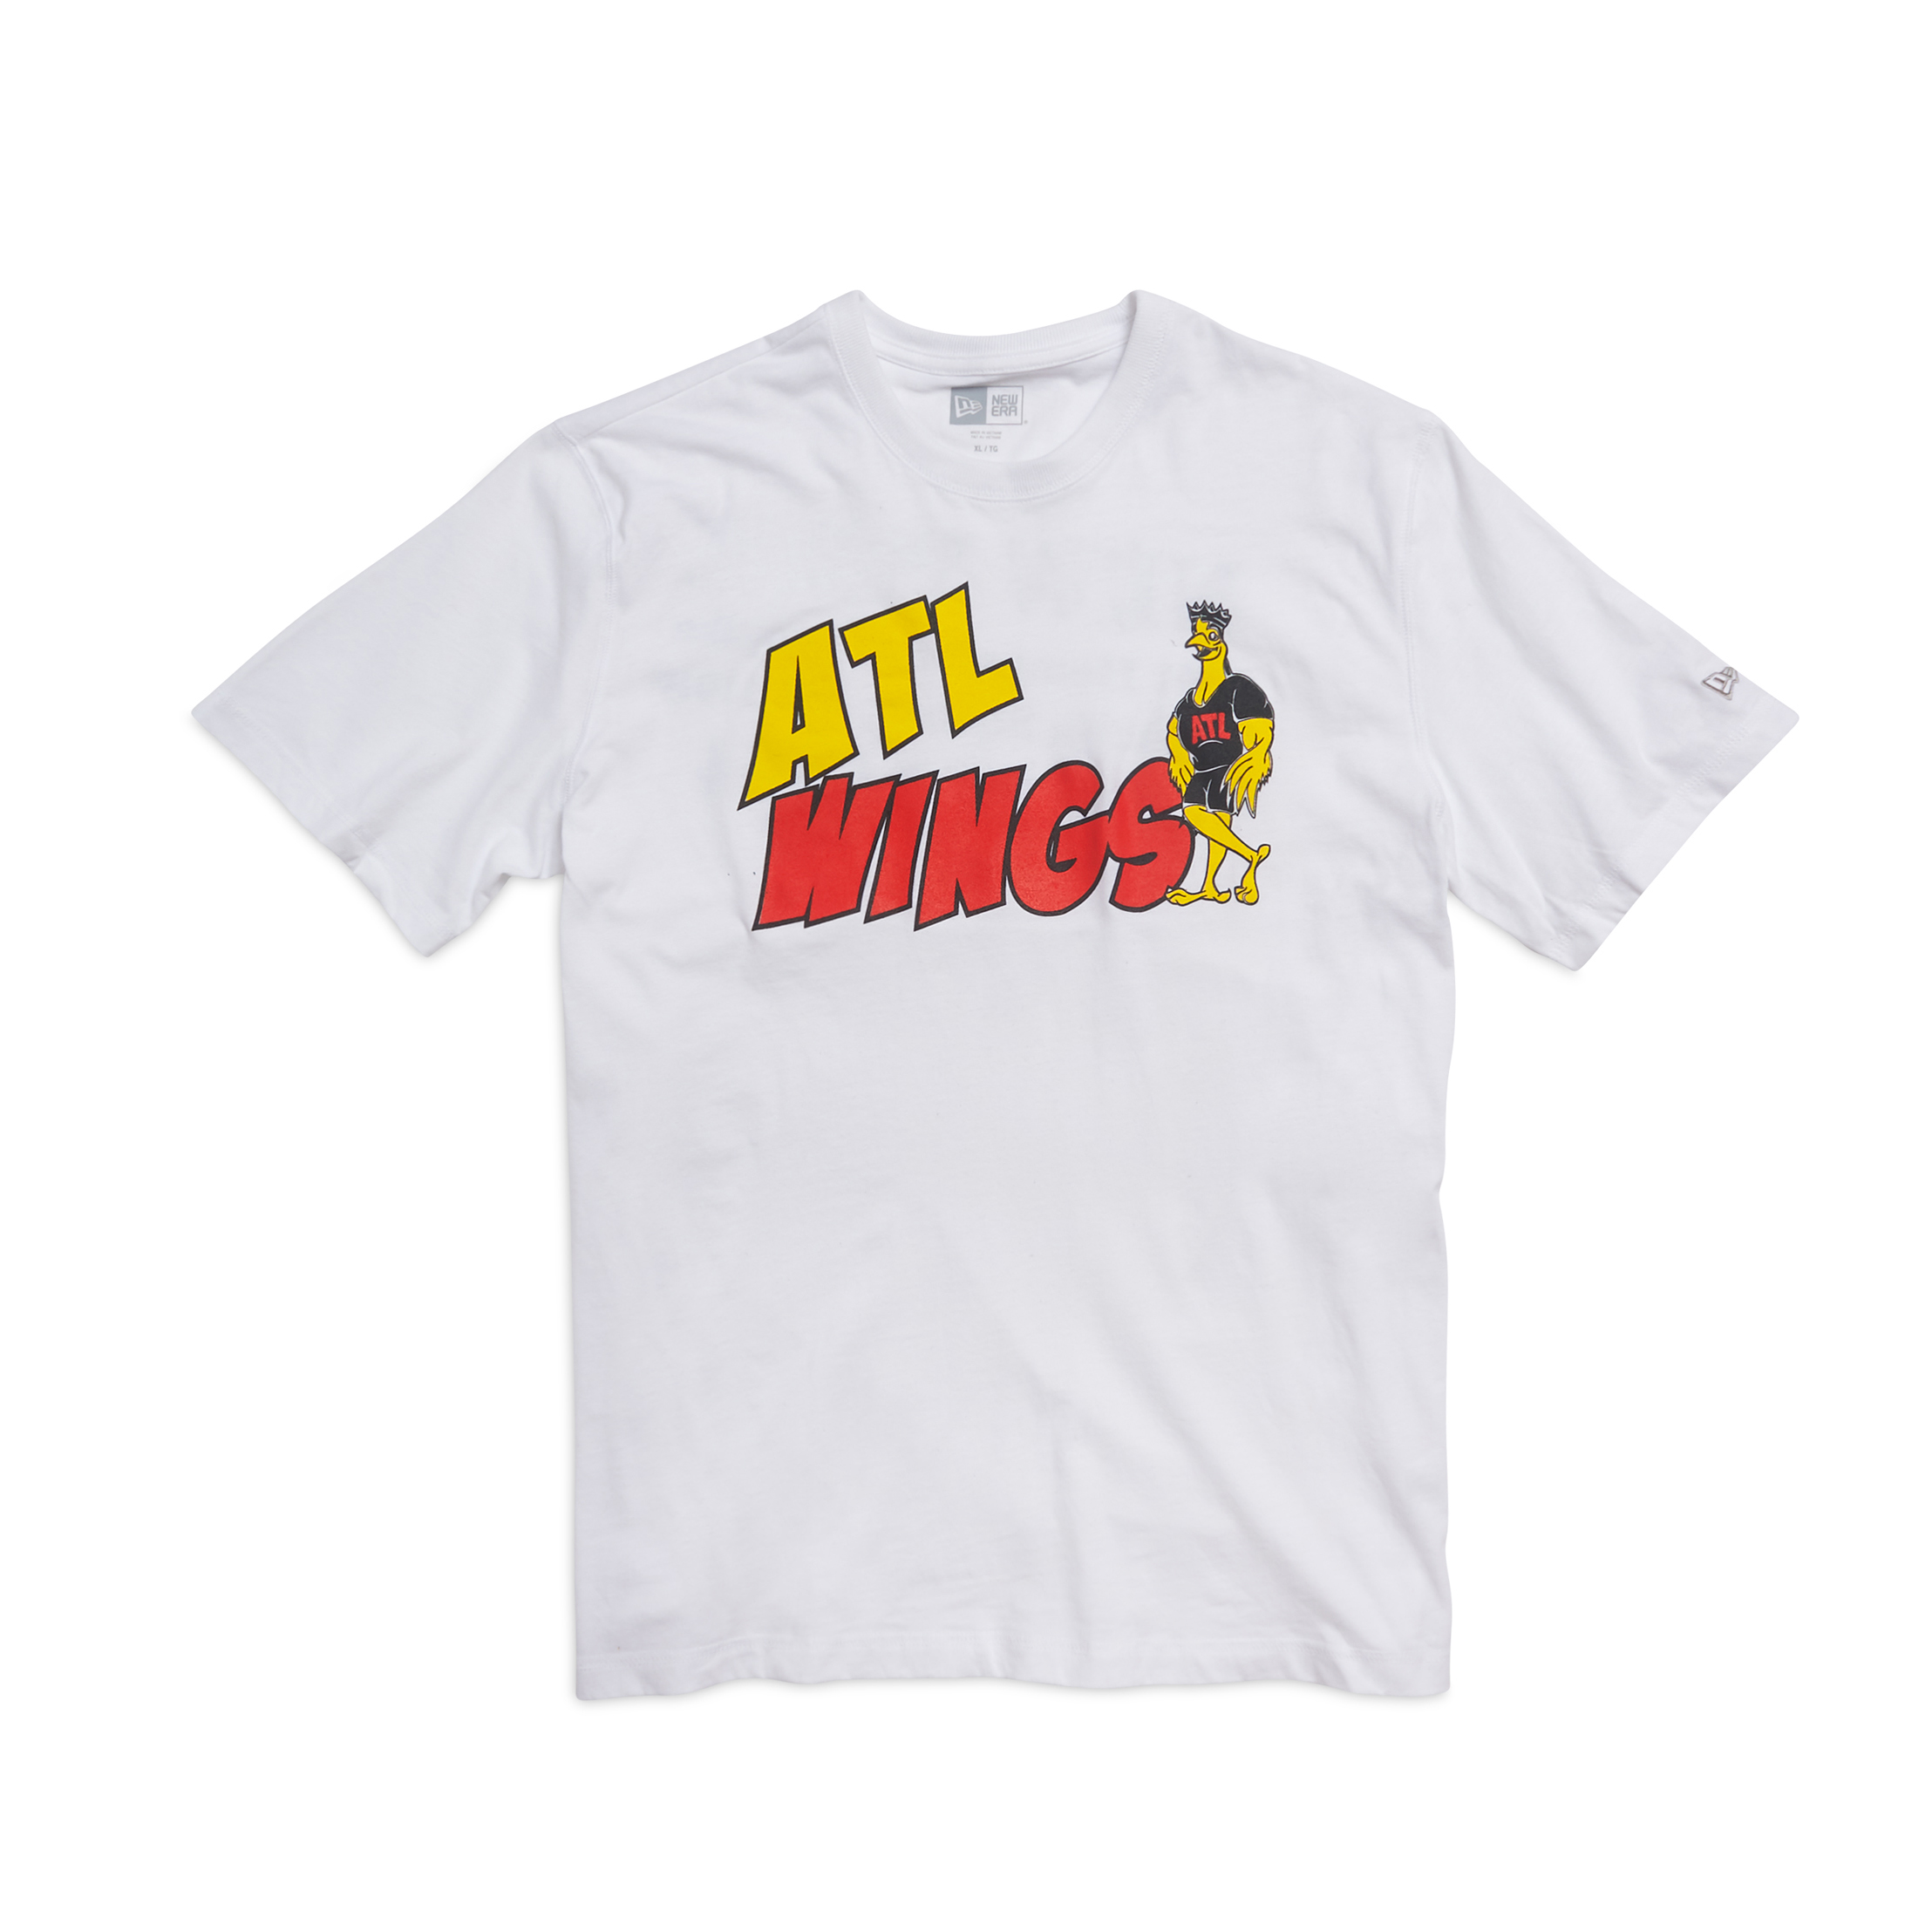 atl-wings-t-shirt-front